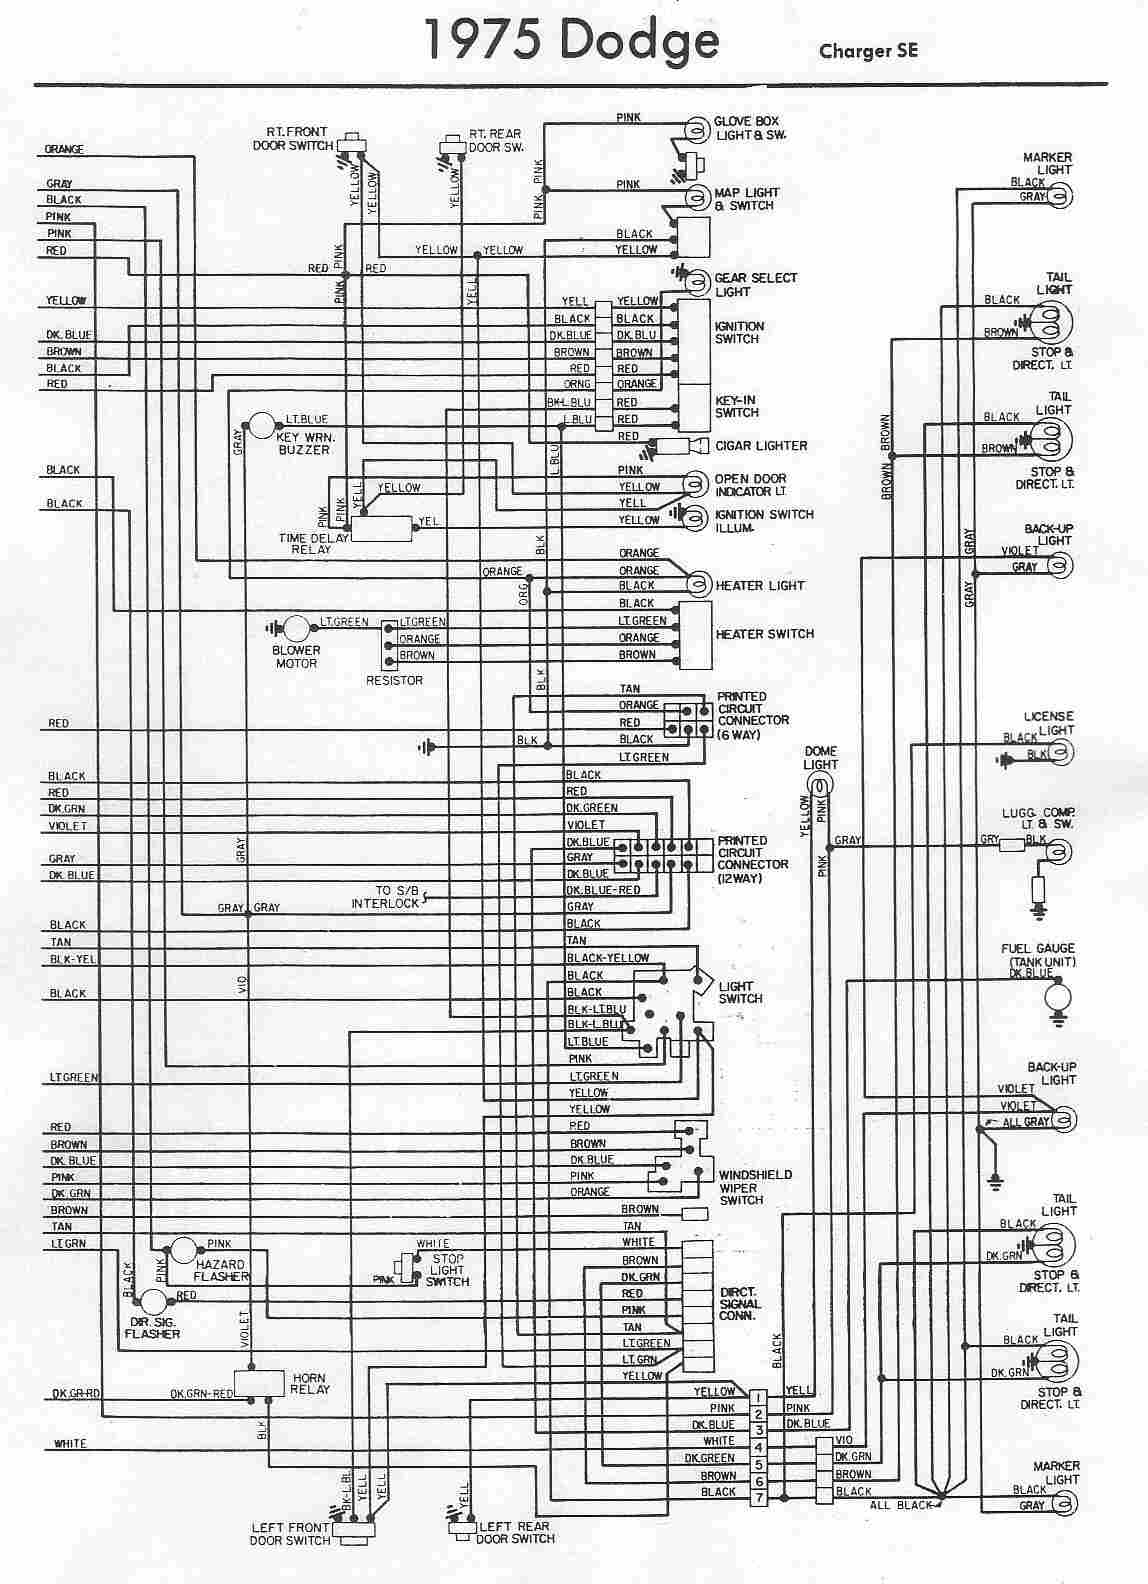 2013 Dodge Challenger Underhood Wiring Diagram | Online